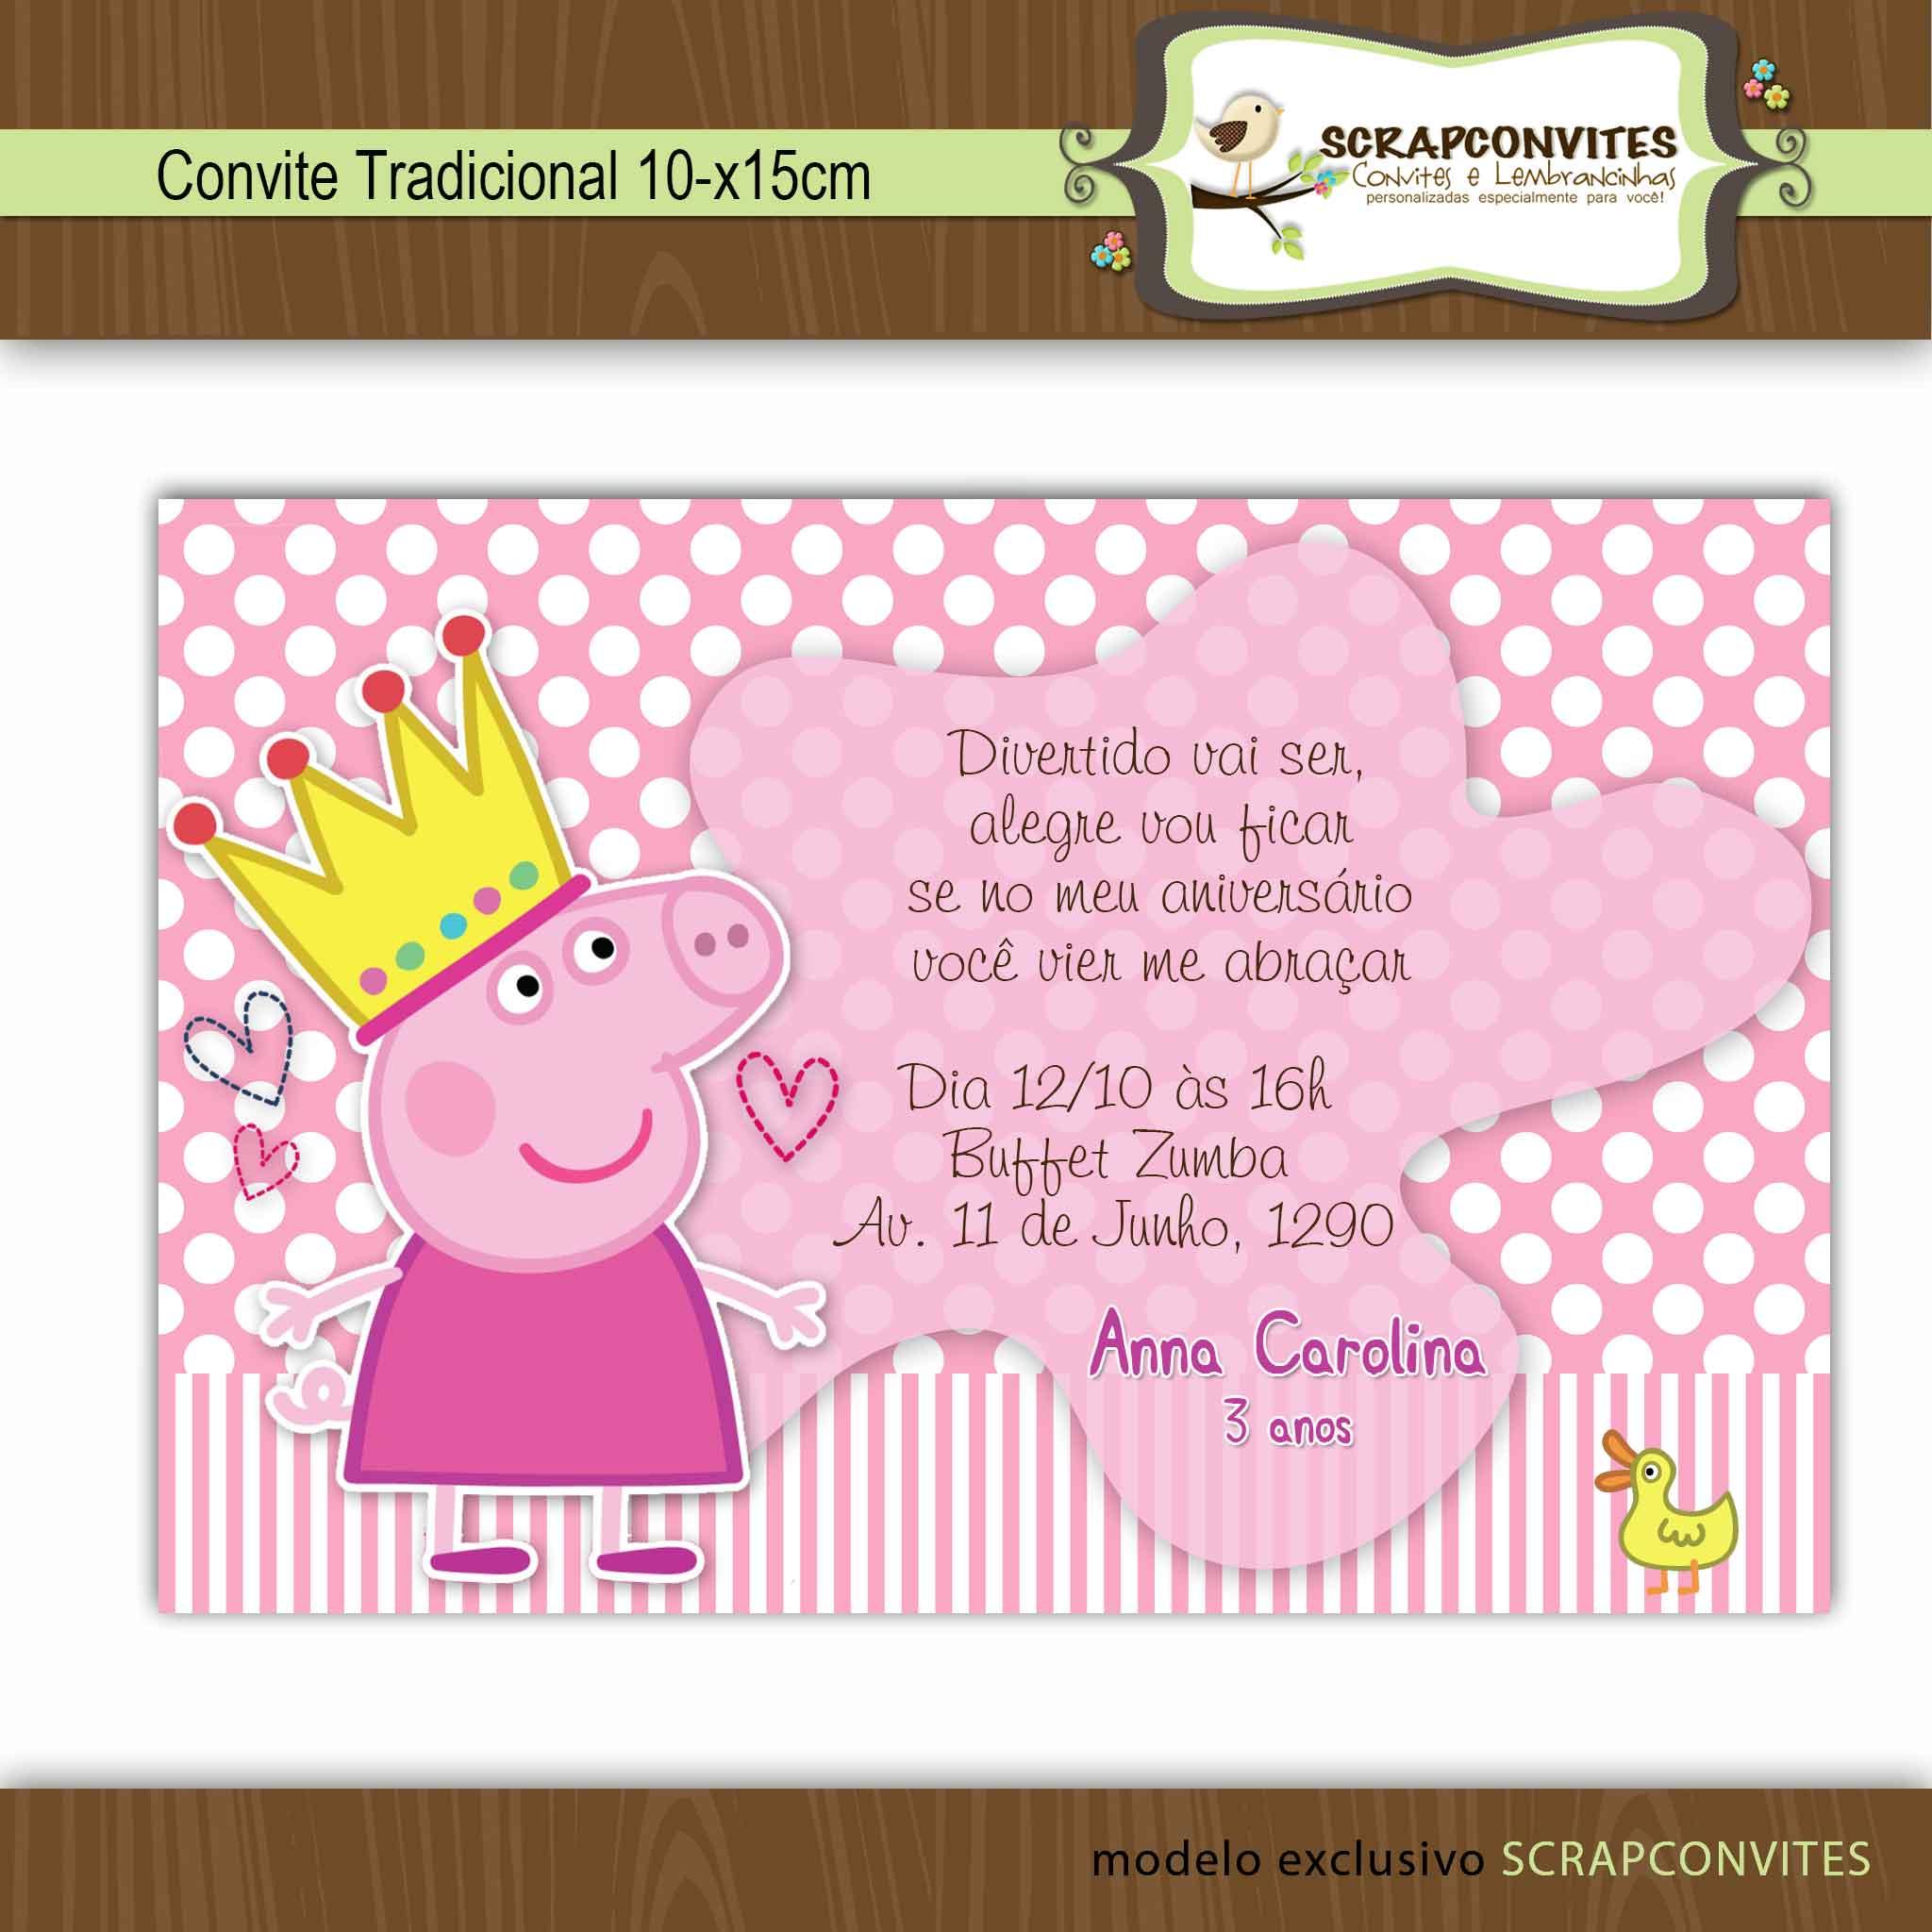 Convite Peppa Pig No Elo7 Scrapconvites 37758a